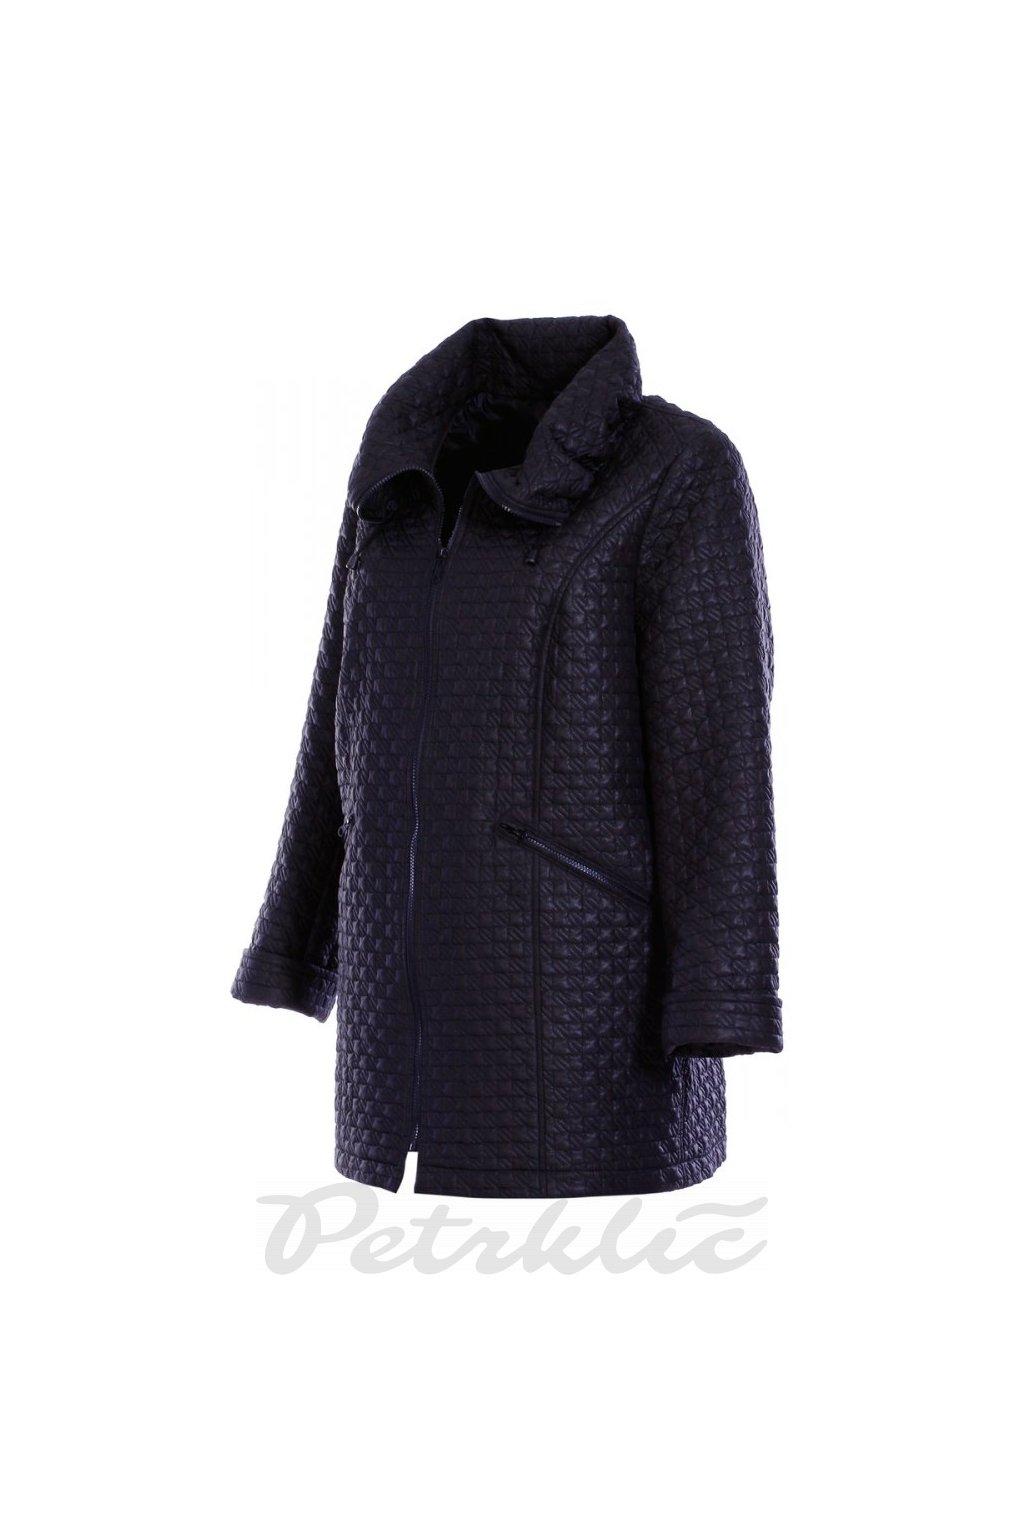 VAFLE - lehká zateplená bunda